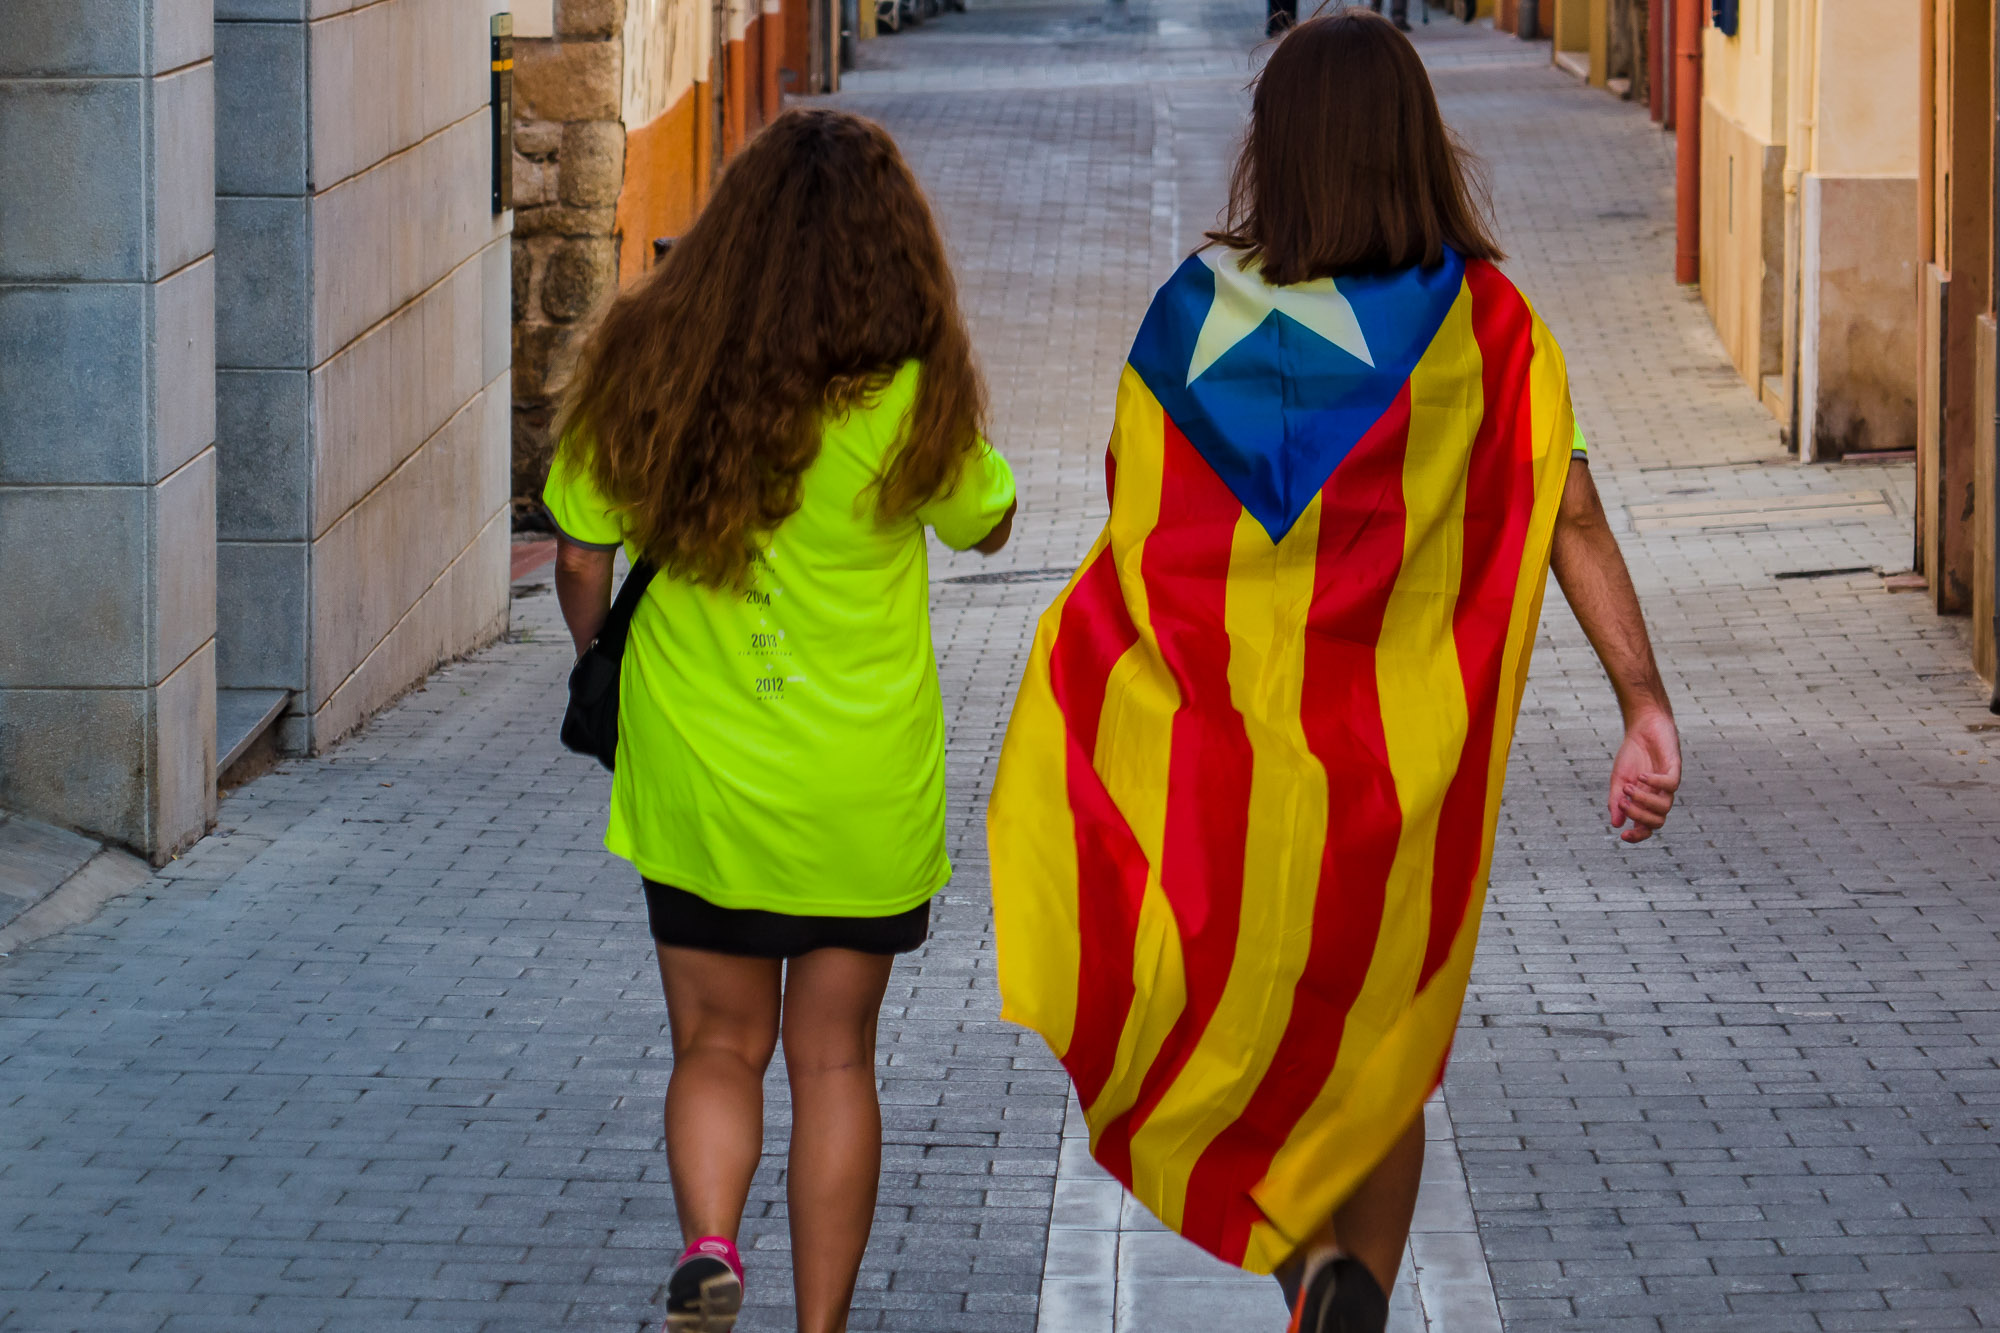 Catalunya-Sí